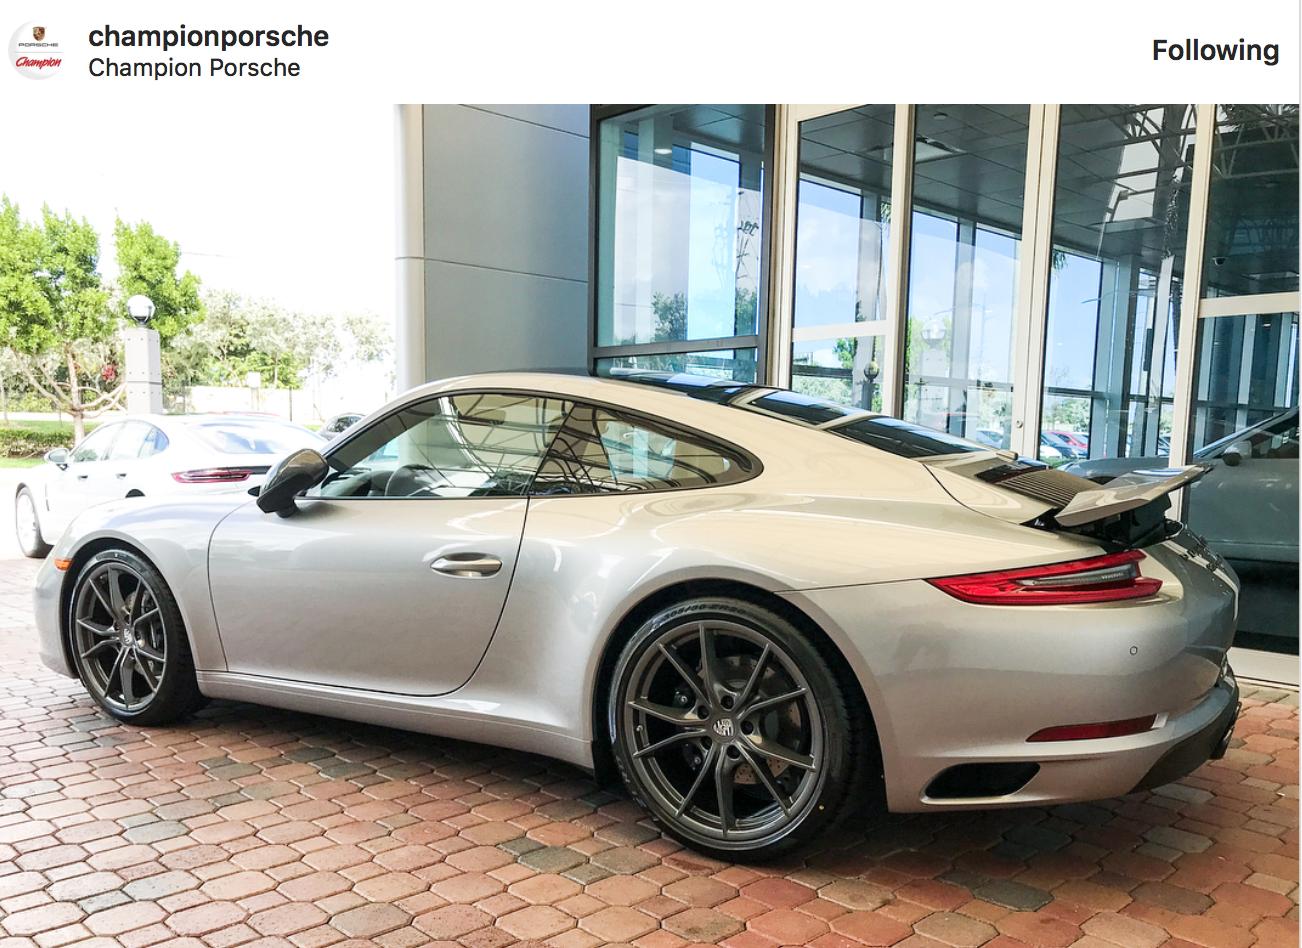 Landed Carrera T Pics Rennlist Porsche Discussion Forums